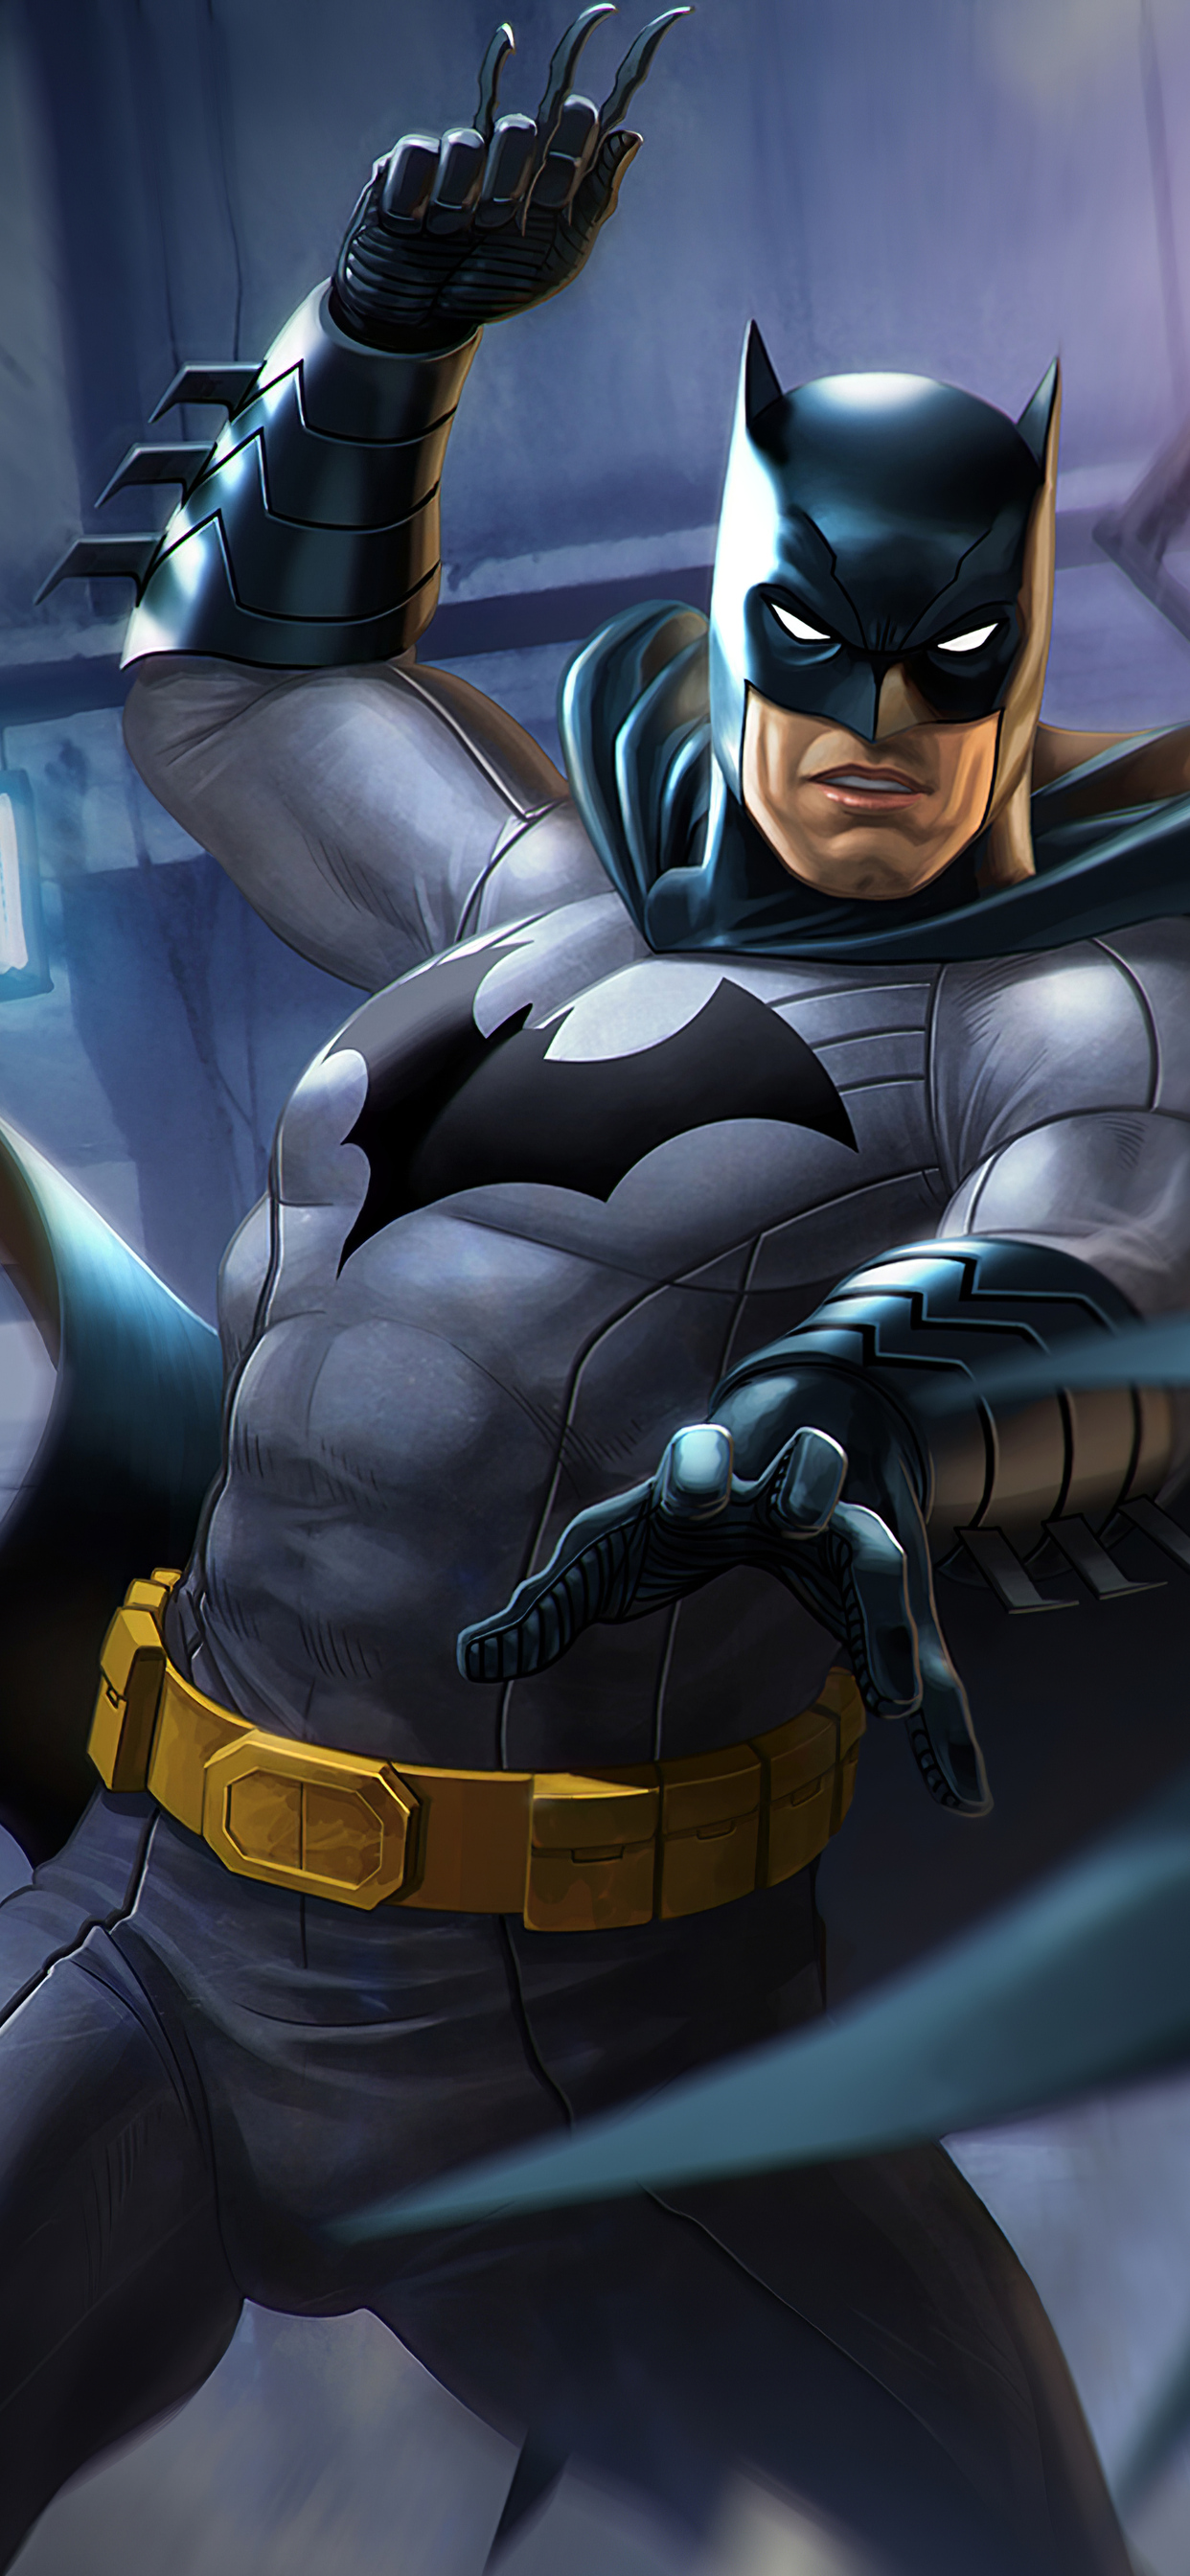 batman-and-the-flash-dc-comic-art-eu.jpg